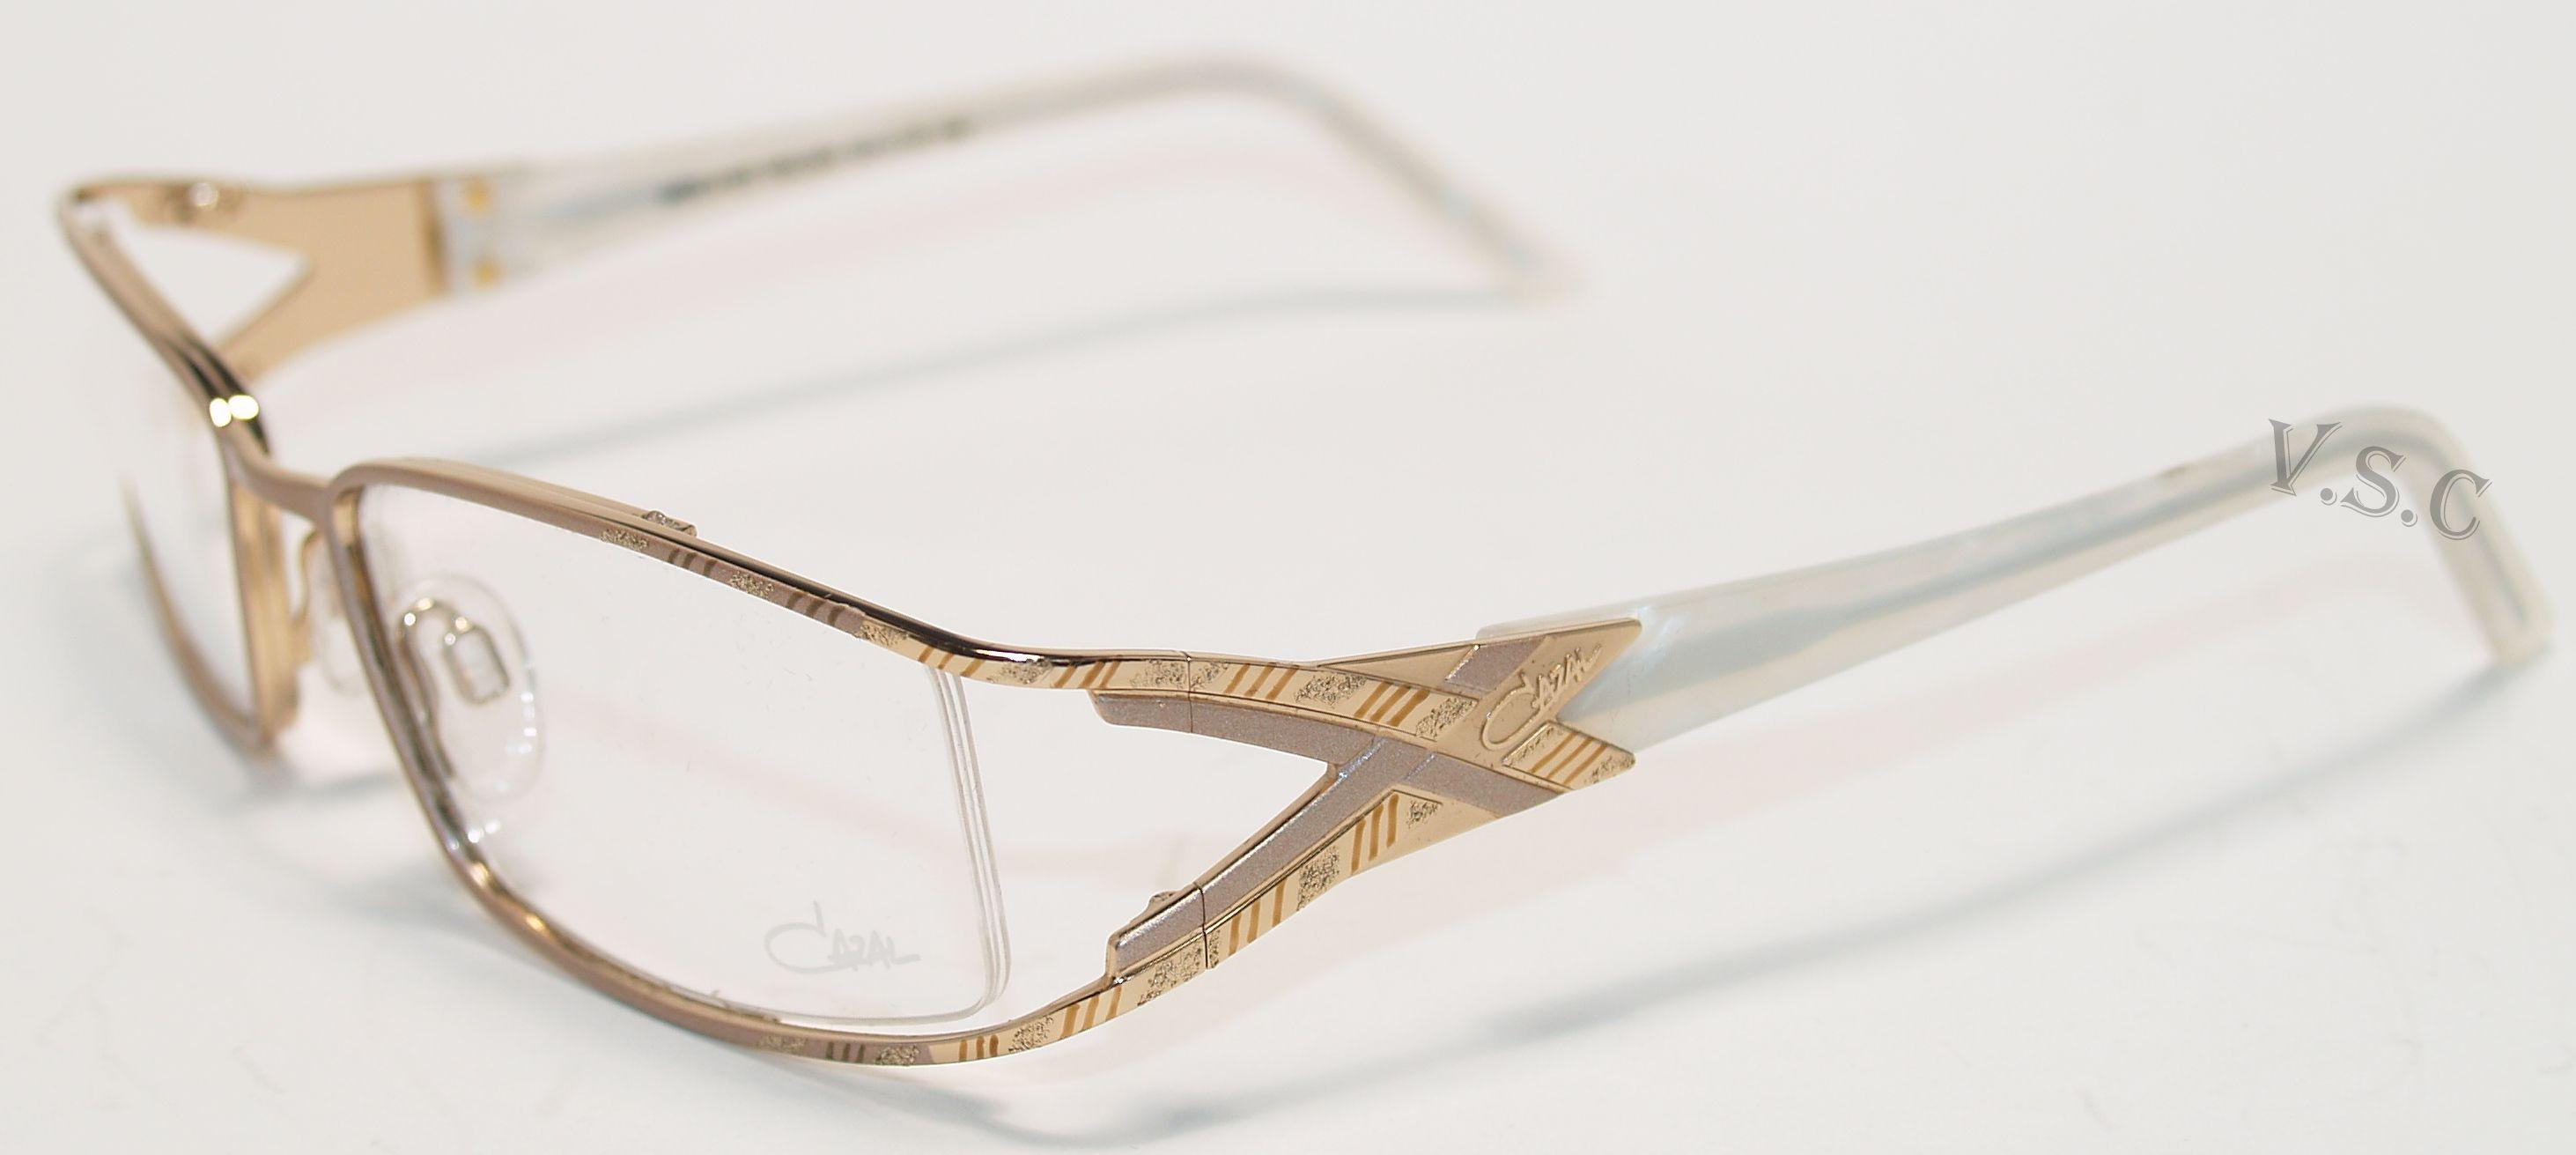 bce80c6b15c0 gold exotic prescription eyewear frames